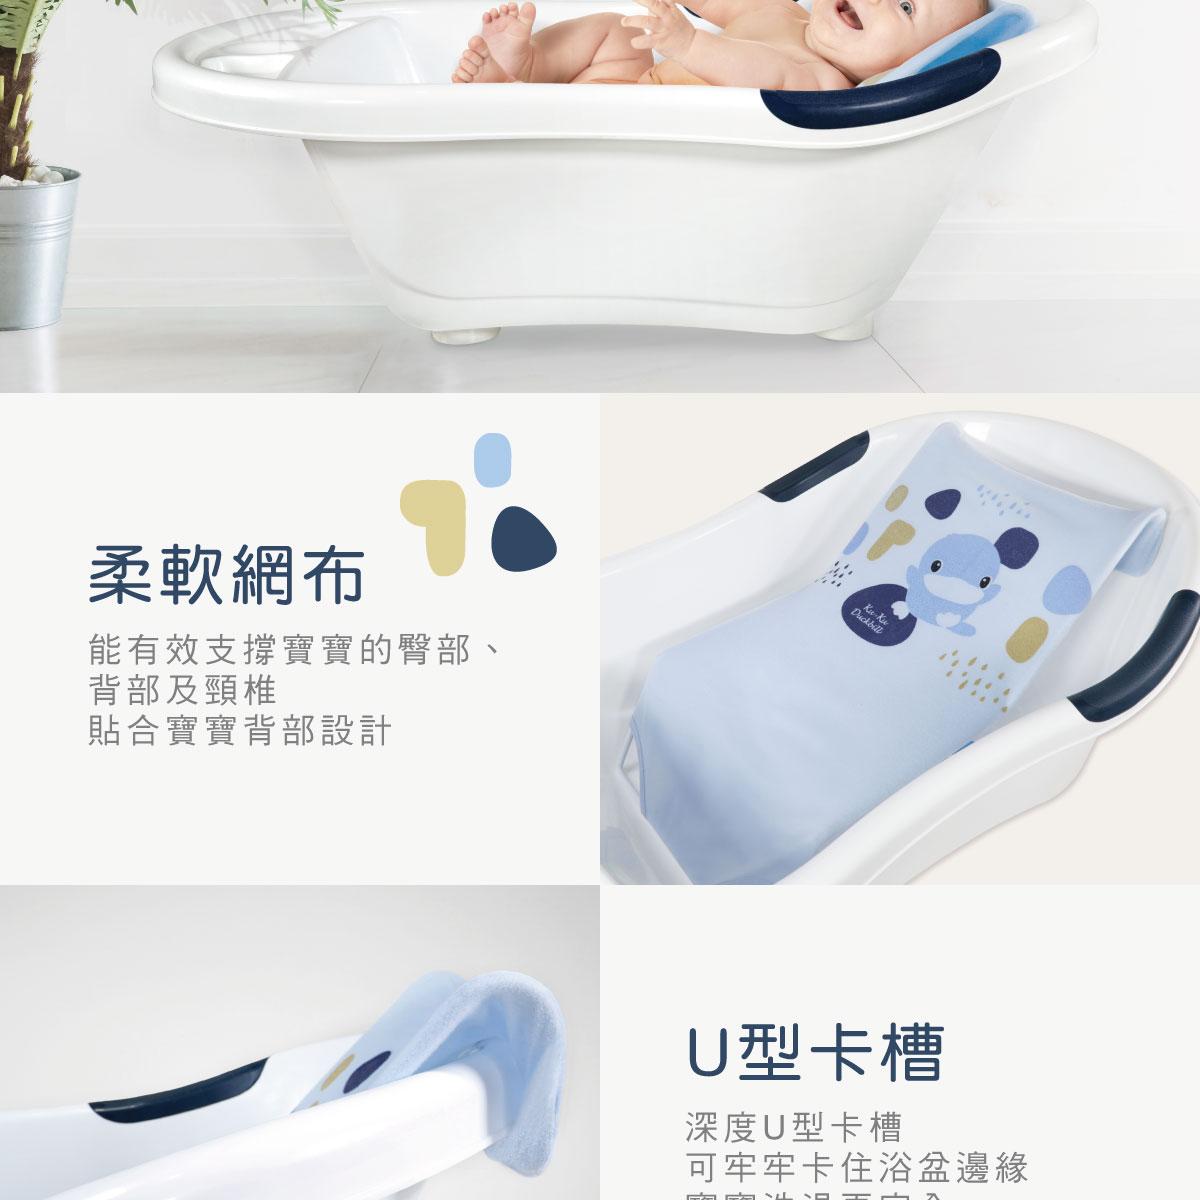 proimages/Bathing&CleanSeries/Bathing/BabyBathTub/1133/1133-成長印記沐浴床-EDM-5.jpg